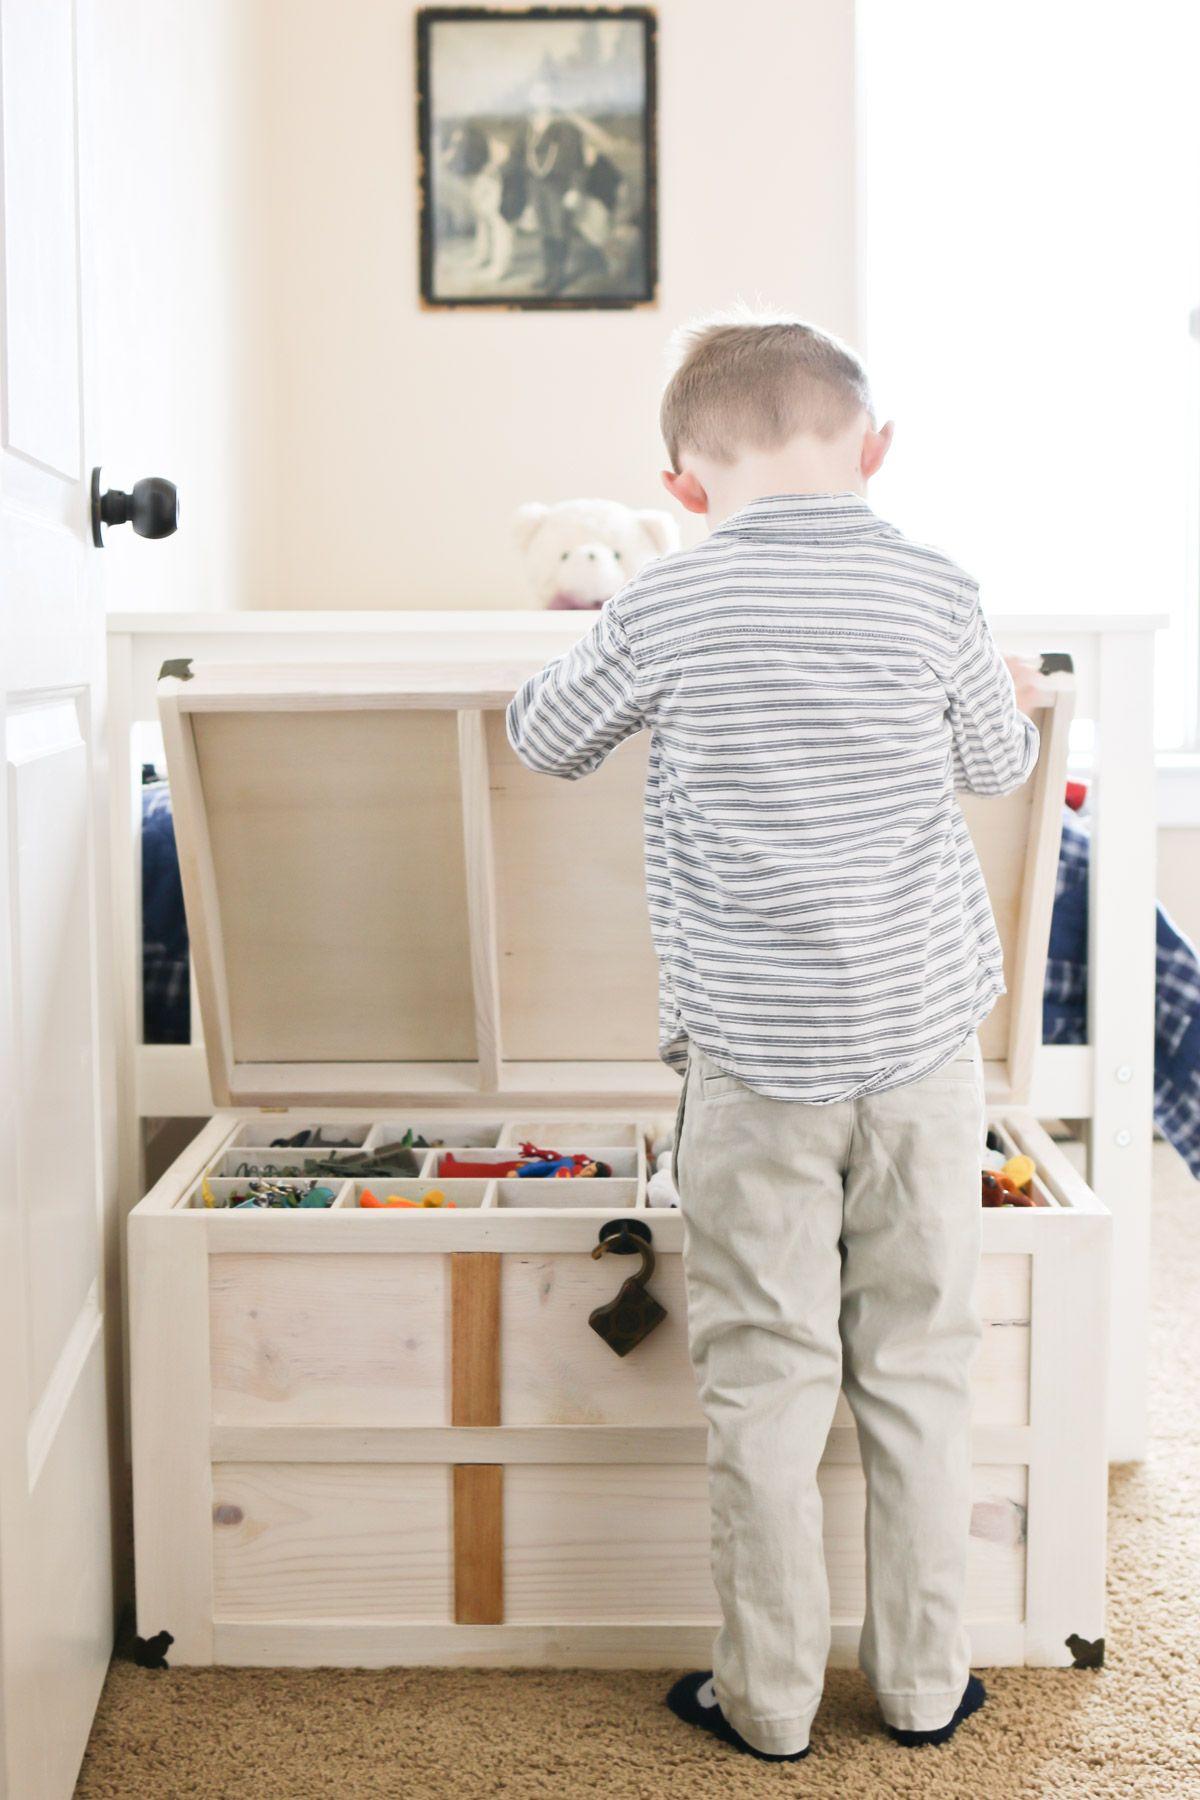 Diy Toy Storage Treasure Chest Tidbits Diy Toy Storage Toy Storage Chest Childrens Toy Storage